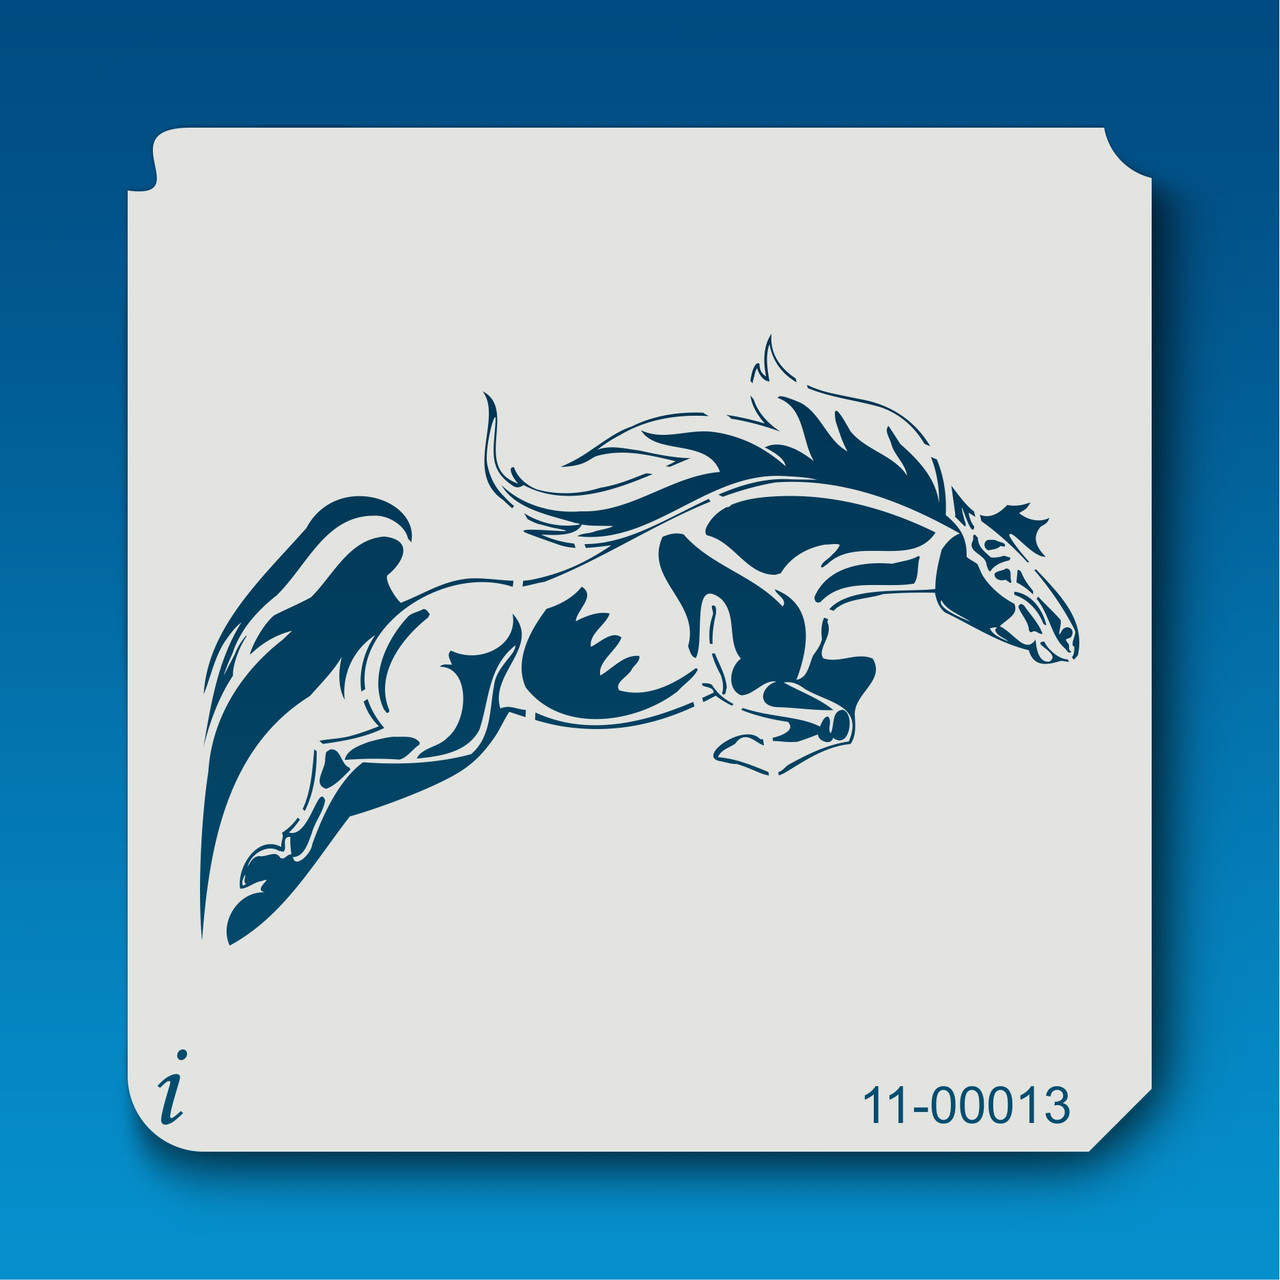 Jumping Horse  stencil 350 micron Mylar not thin stuff  #TaT0041